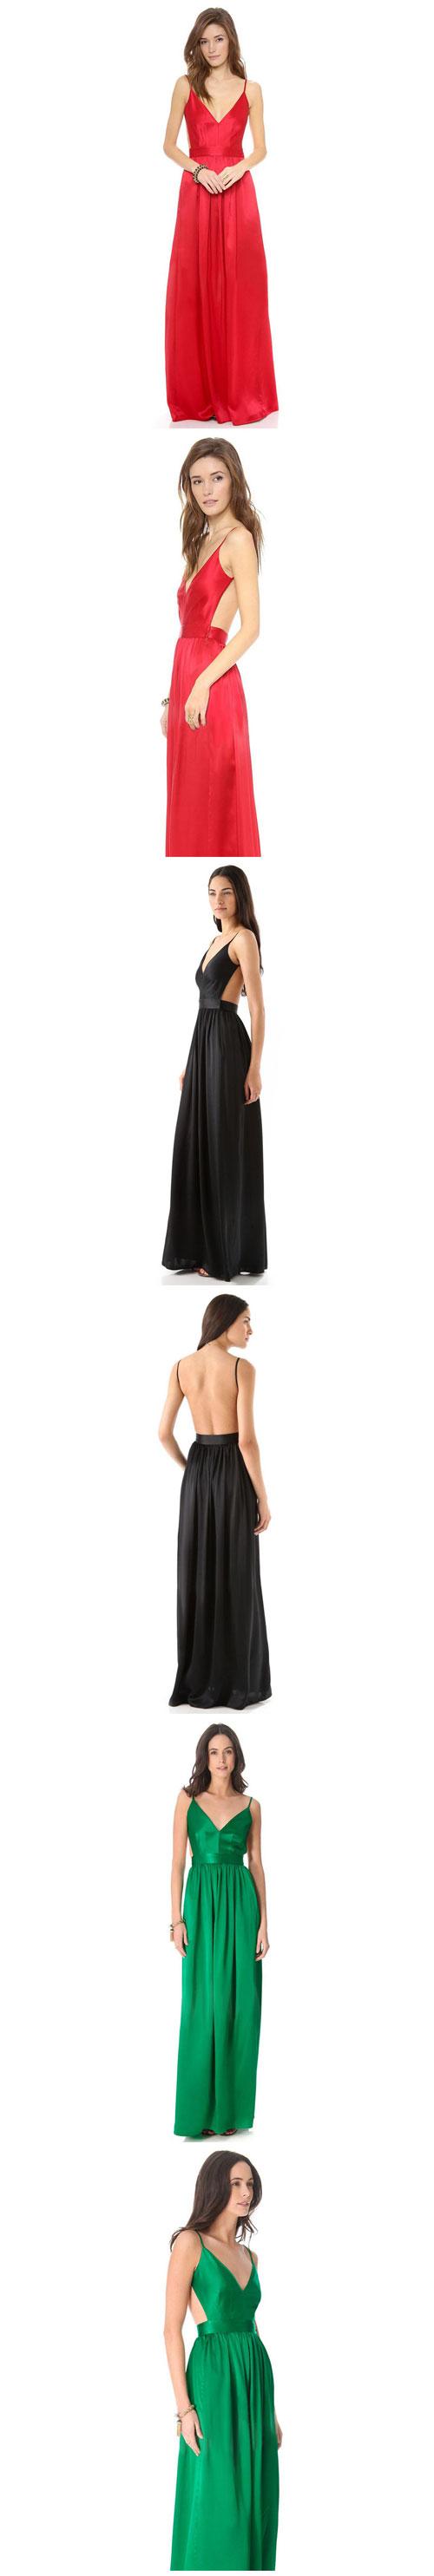 Cut out low back long dress maxi dress pinterest dresses long